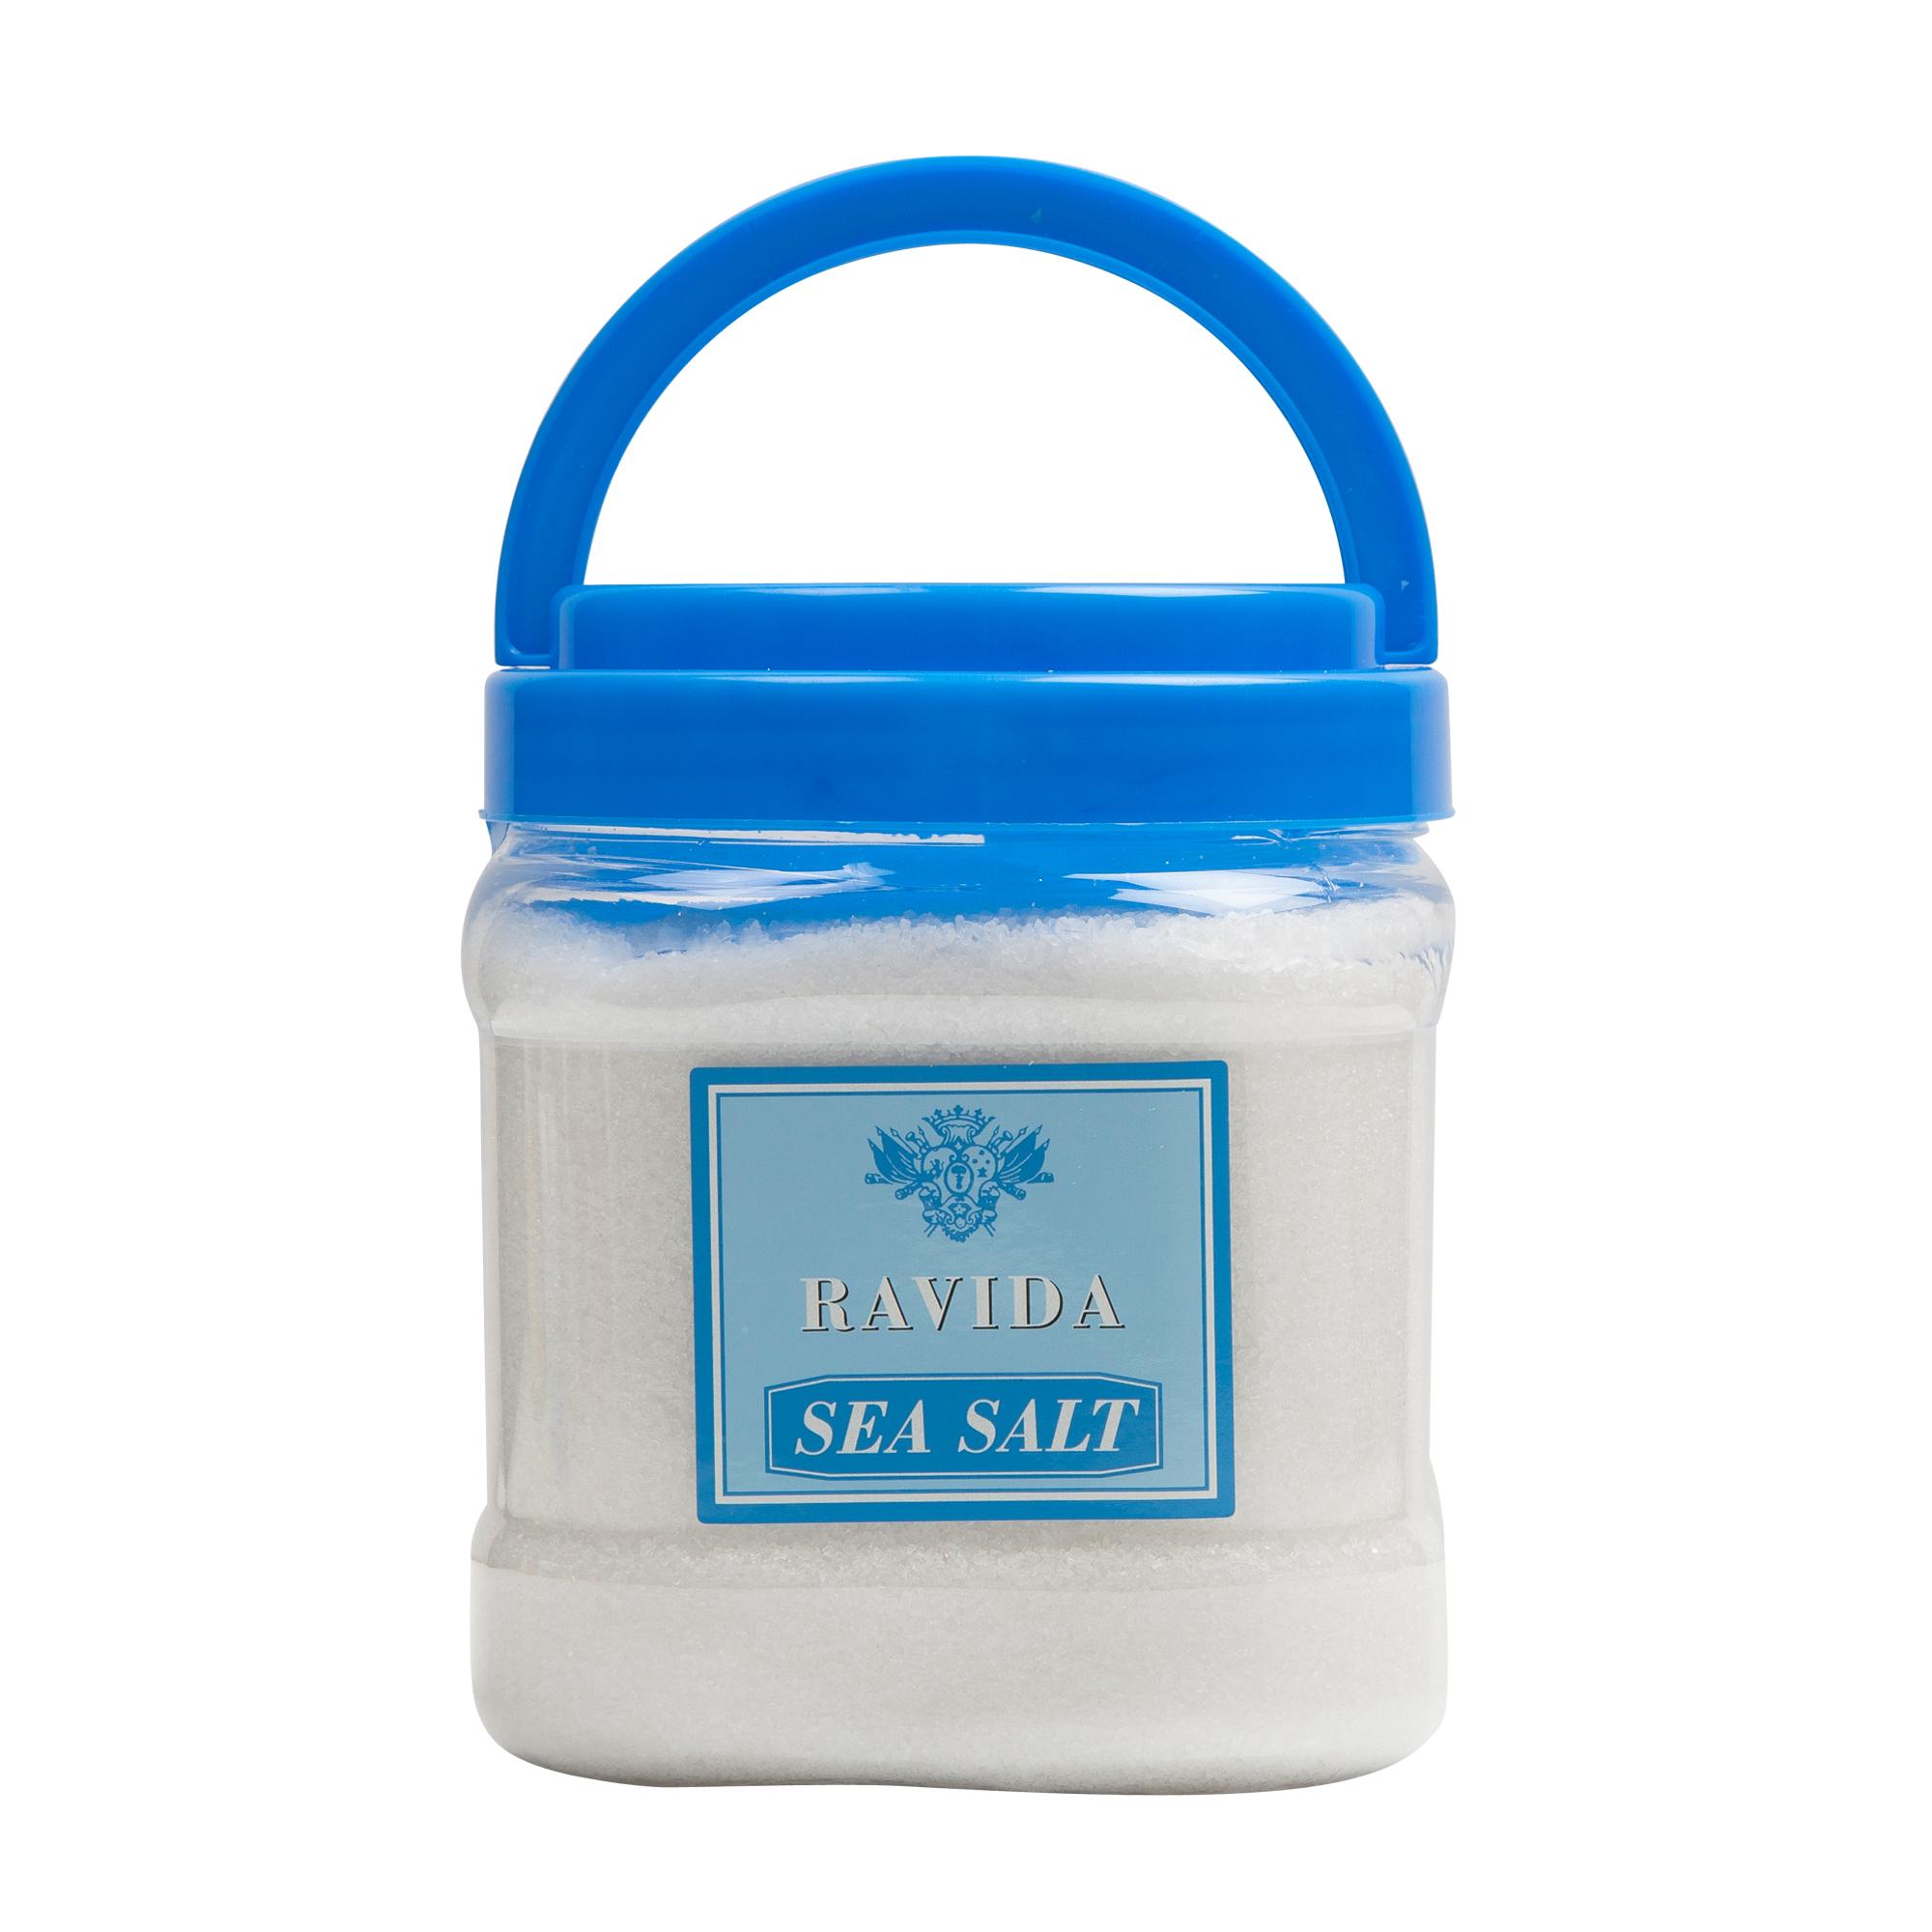 Ravida Sea Salt 1600g Bucket